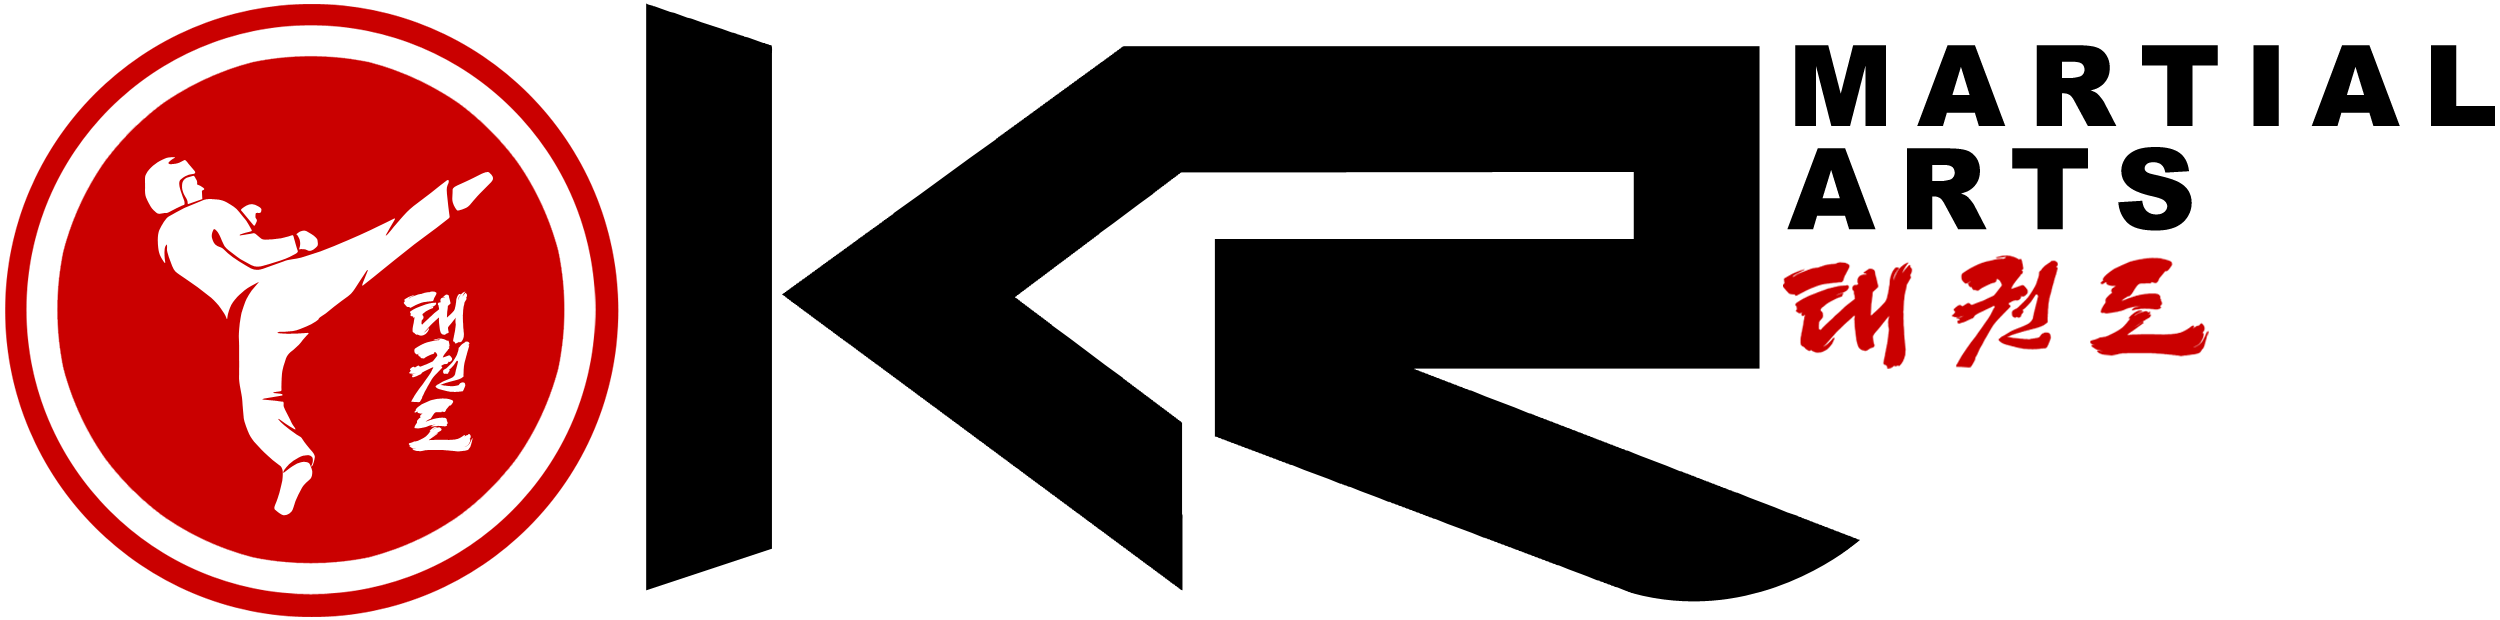 Sturminster Newton-KR Martial Arts 1